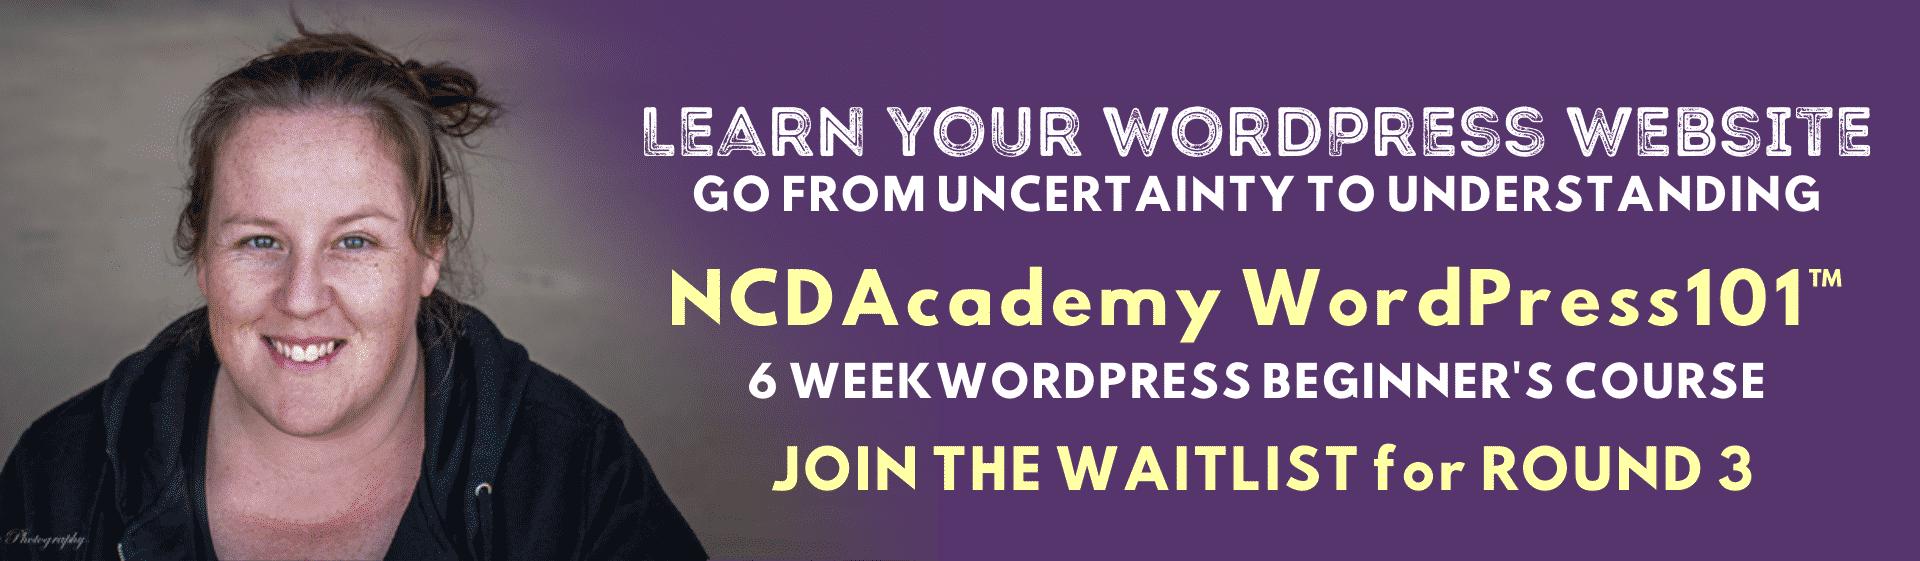 NCDAcademy WordPress101 - 6 week WordPress Beginner's course